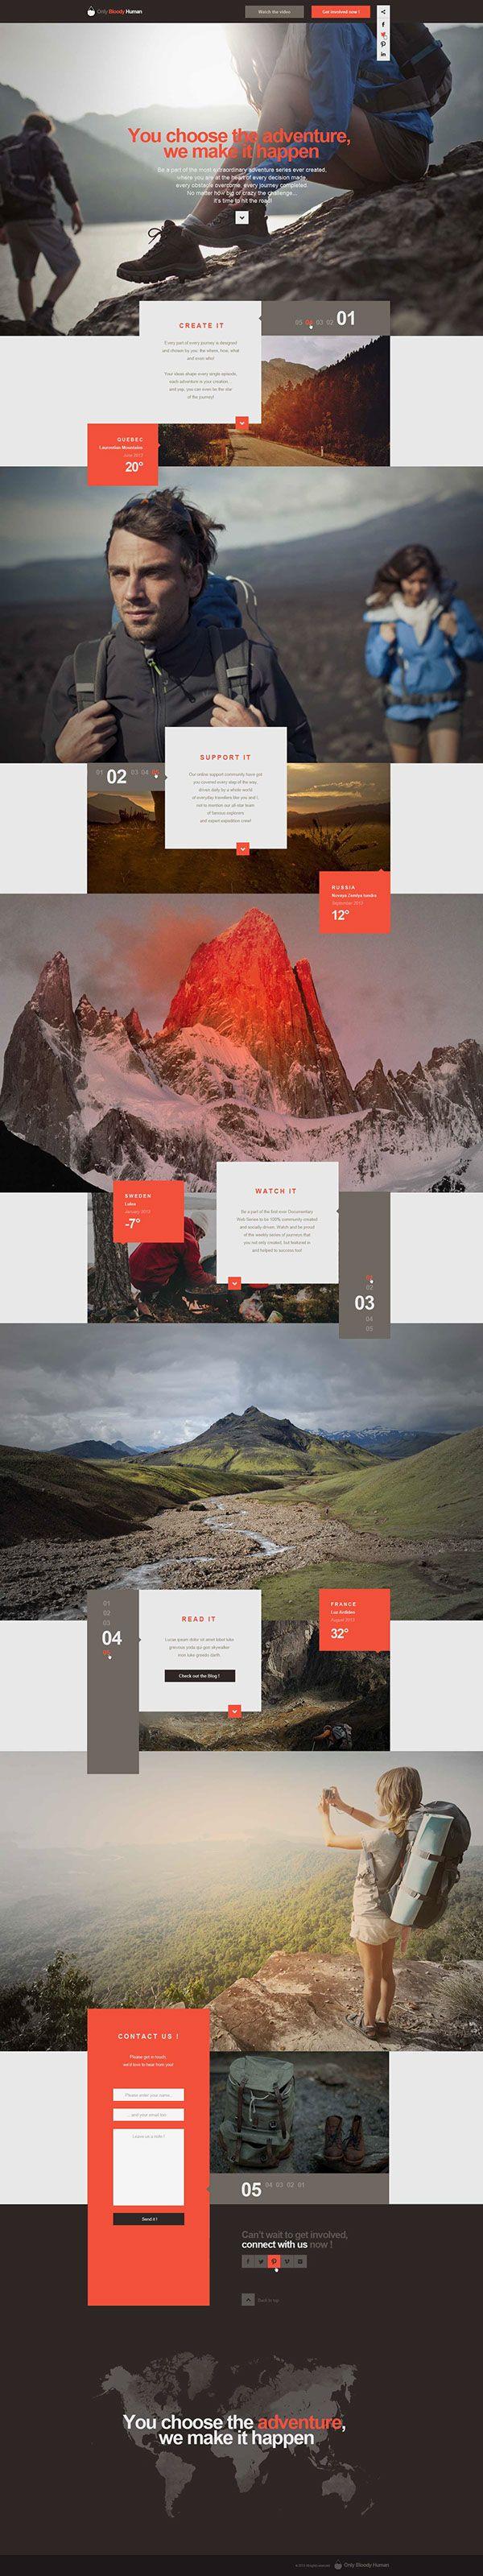 Web | OBH Landing Page Concept on Web Design Served